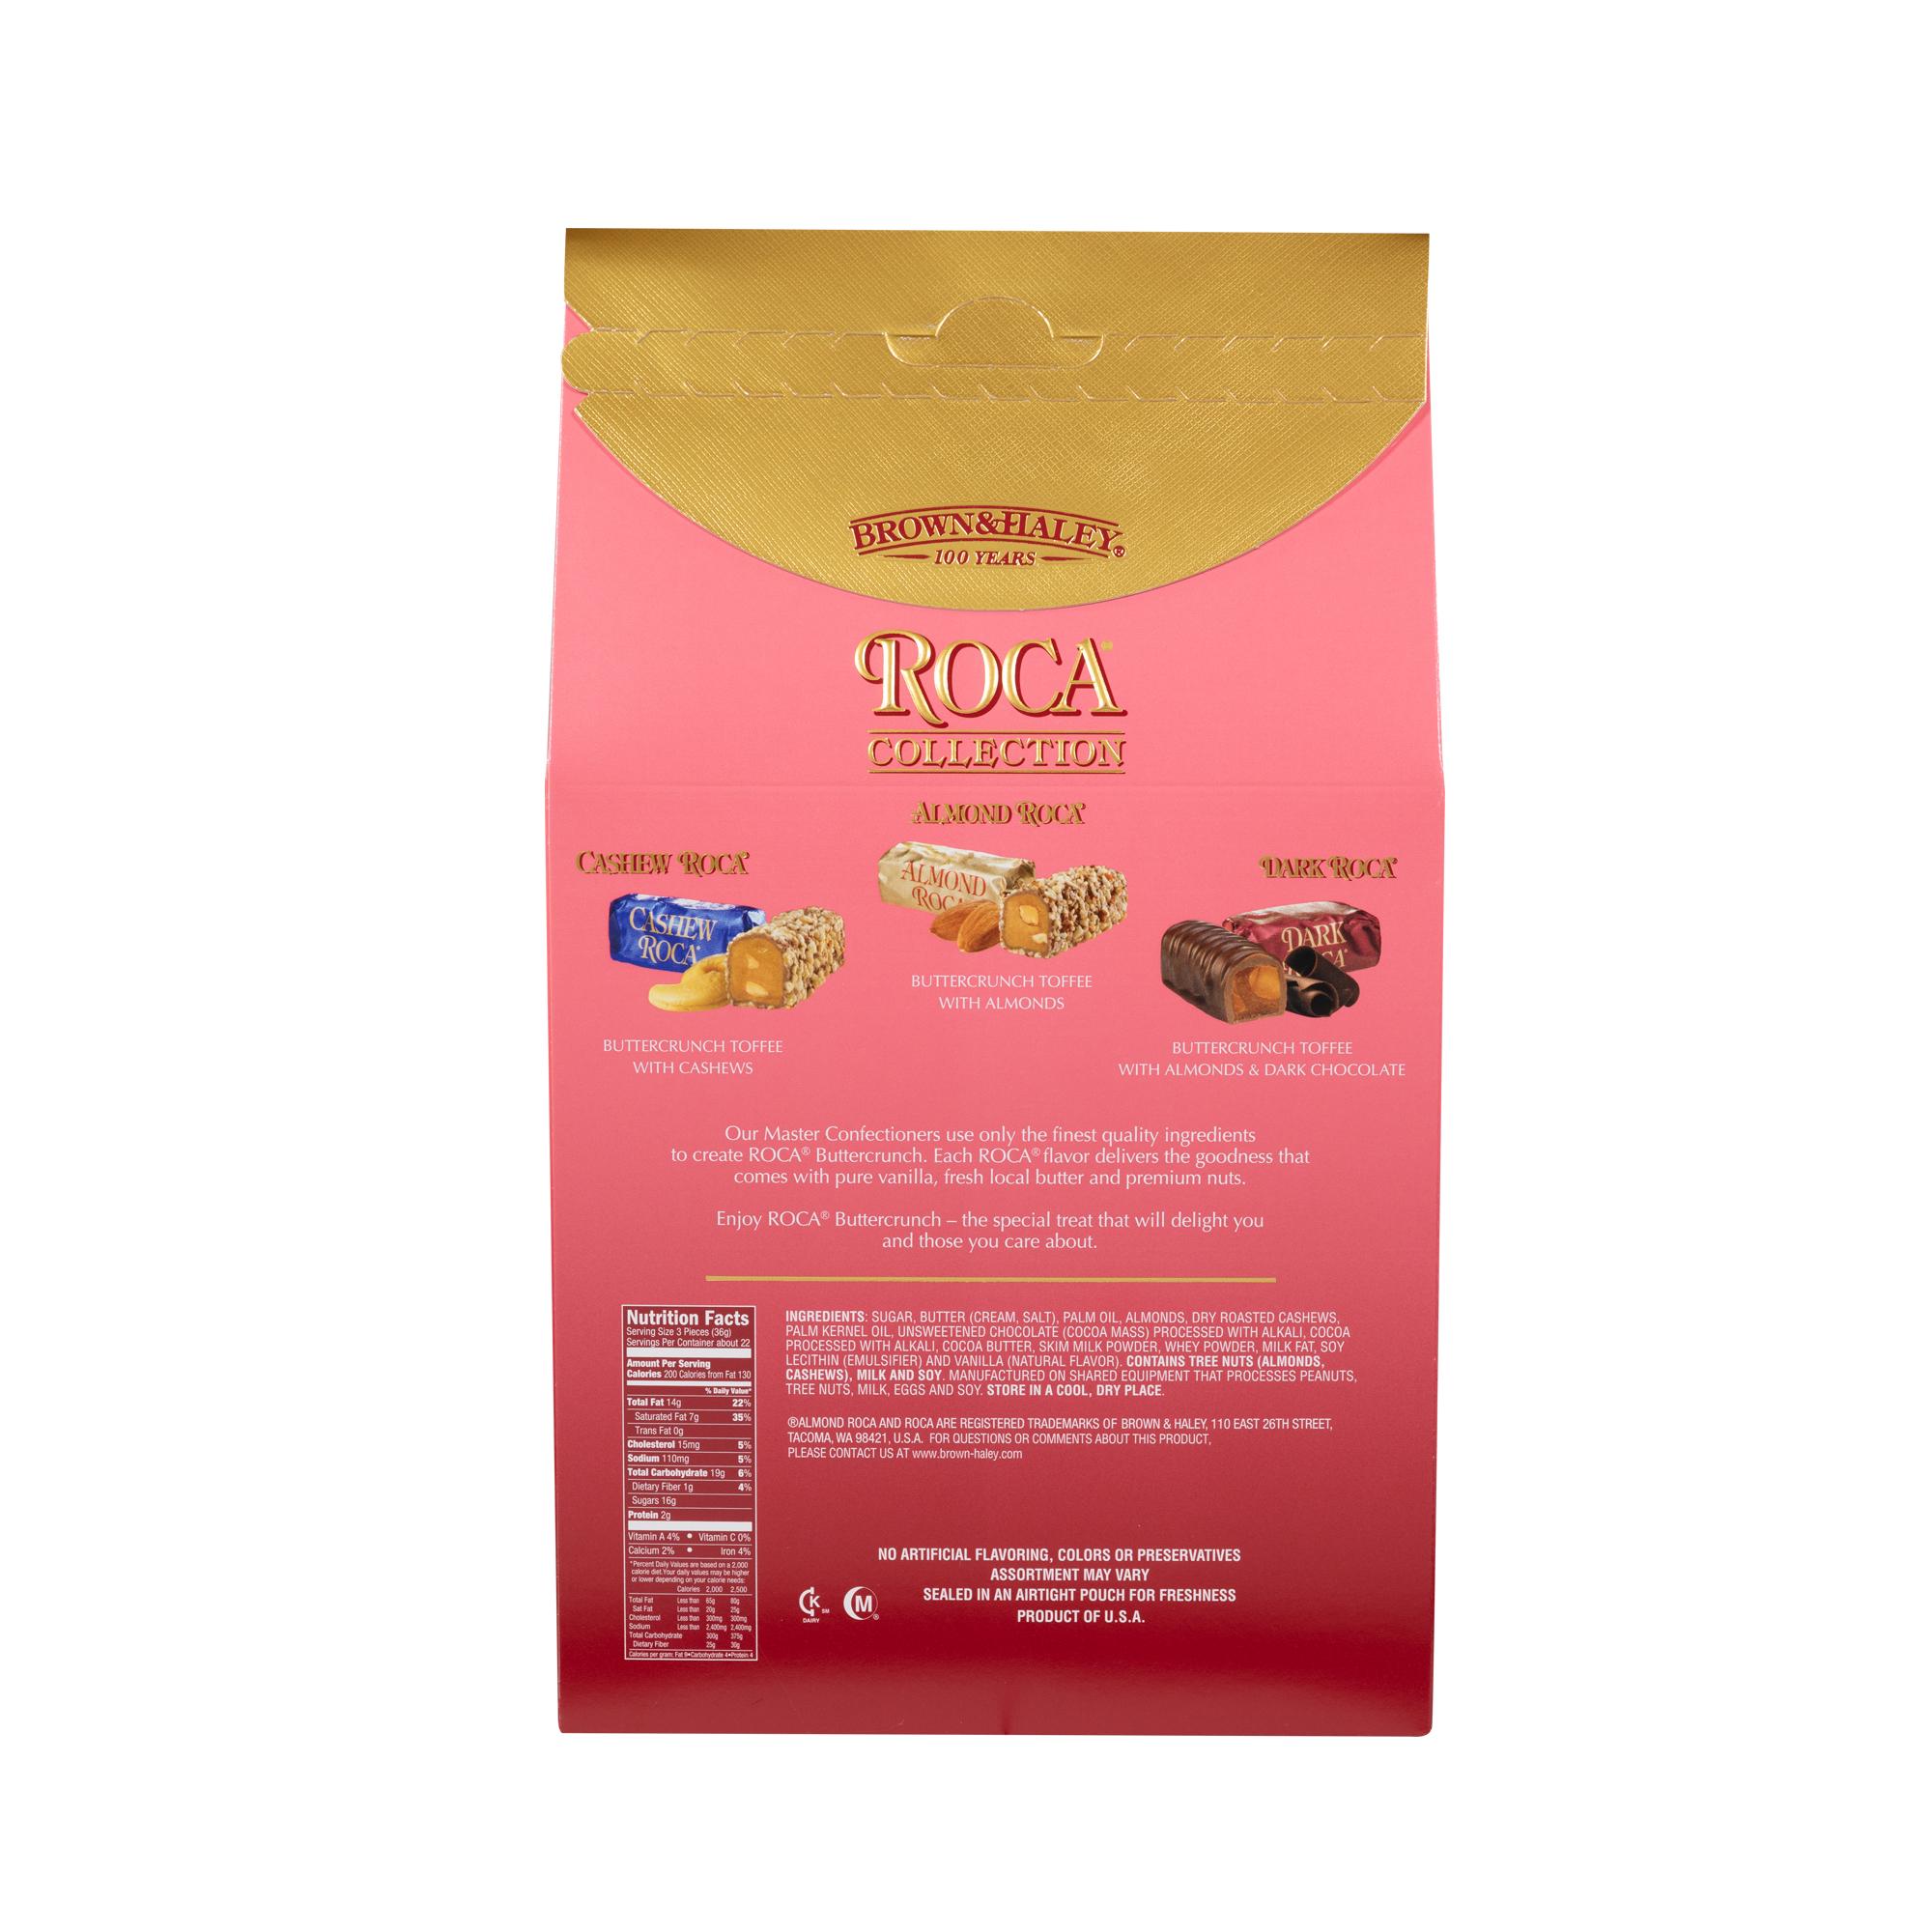 0378 28 oz ASSORTED STAND-UP BOX: CASHEW ROCA®, ALMOND ROCA ® & DARK ROCA® - Back-side View